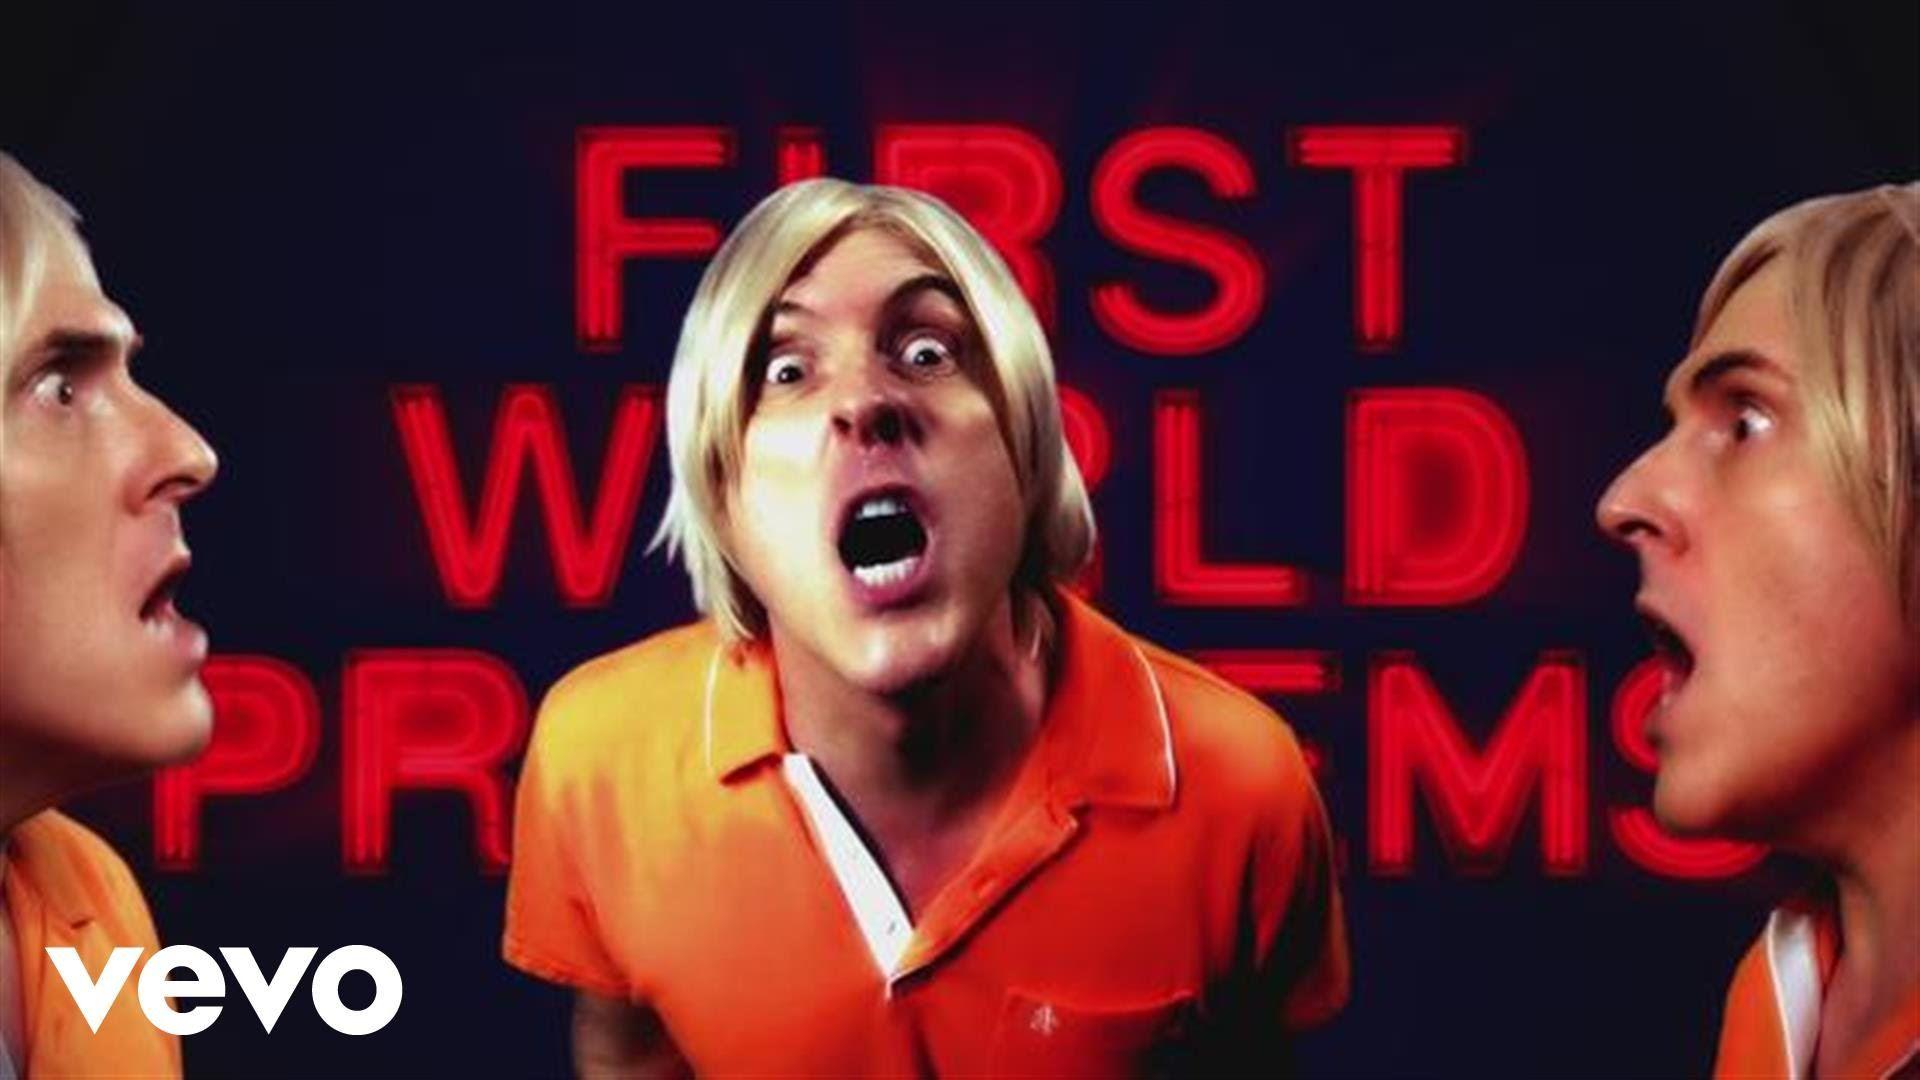 """Weird Al"" Yankovic - First World Problems - YouTube"